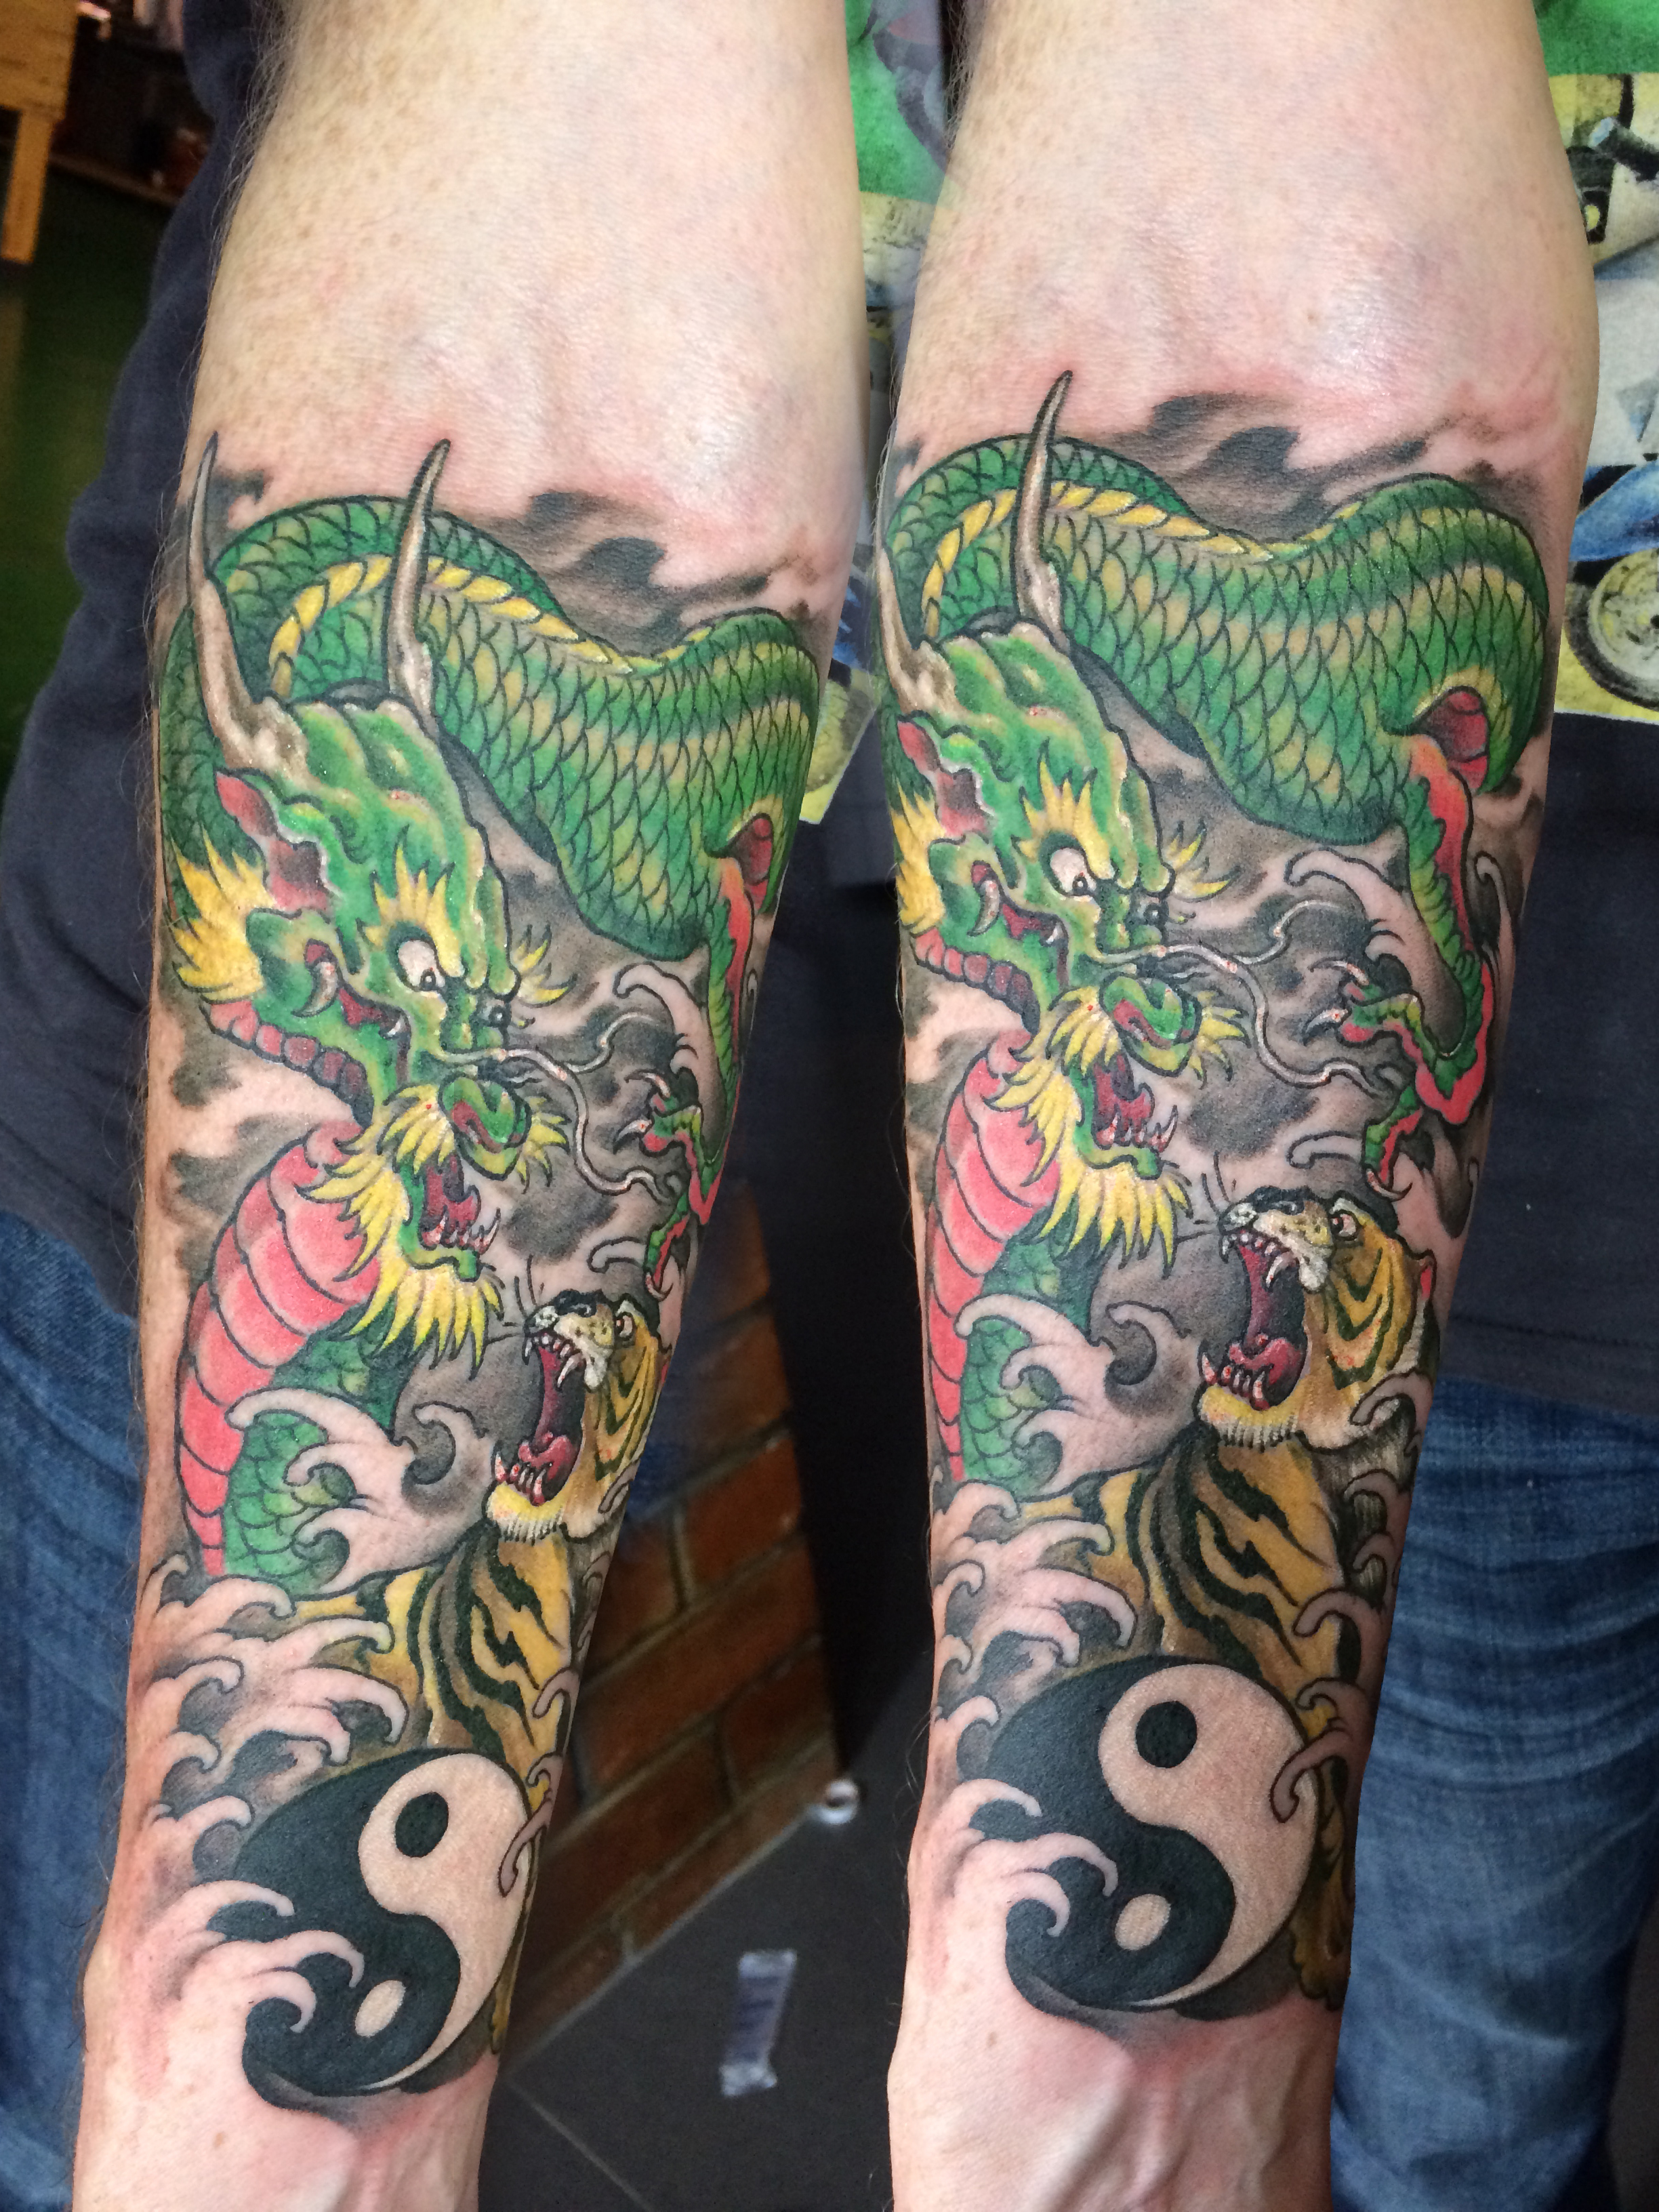 color-dragon-tiger-forearm-tattoo - ShanghaiTattoo